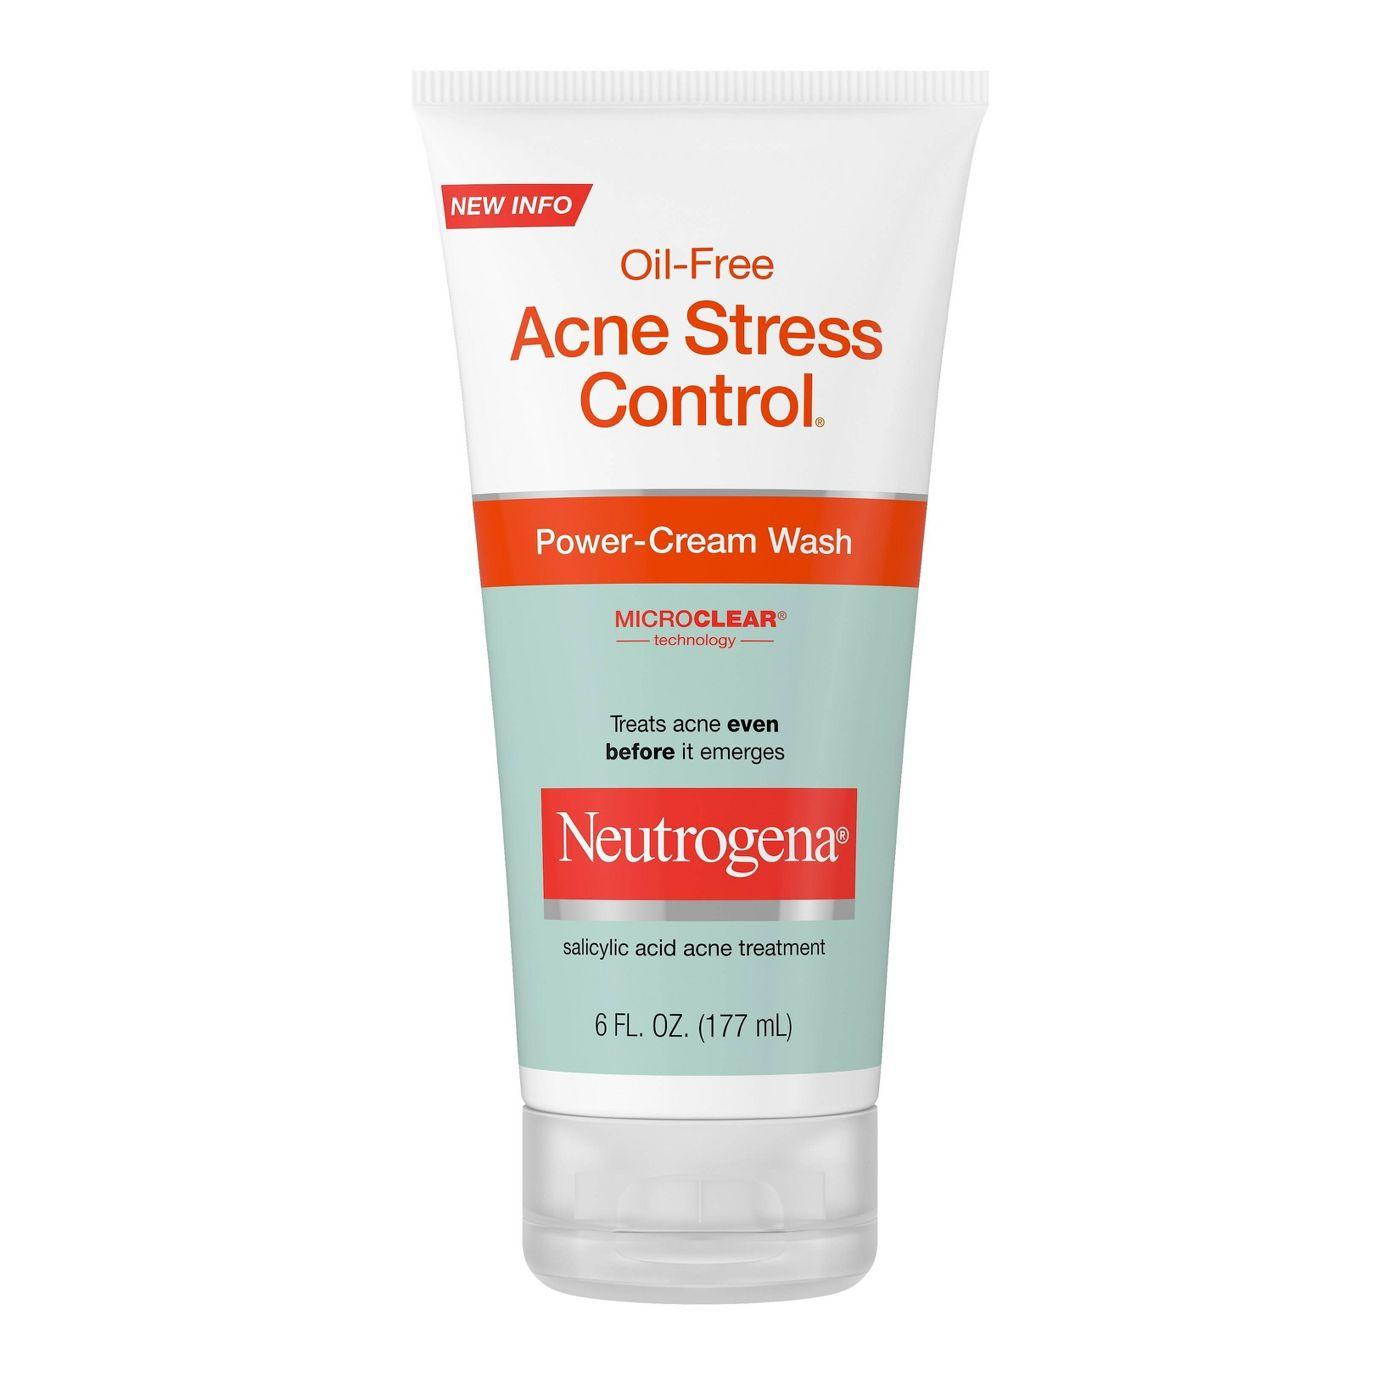 Neutrogena Oil-Free Acne Stress Control Power-Cream Wash 177g